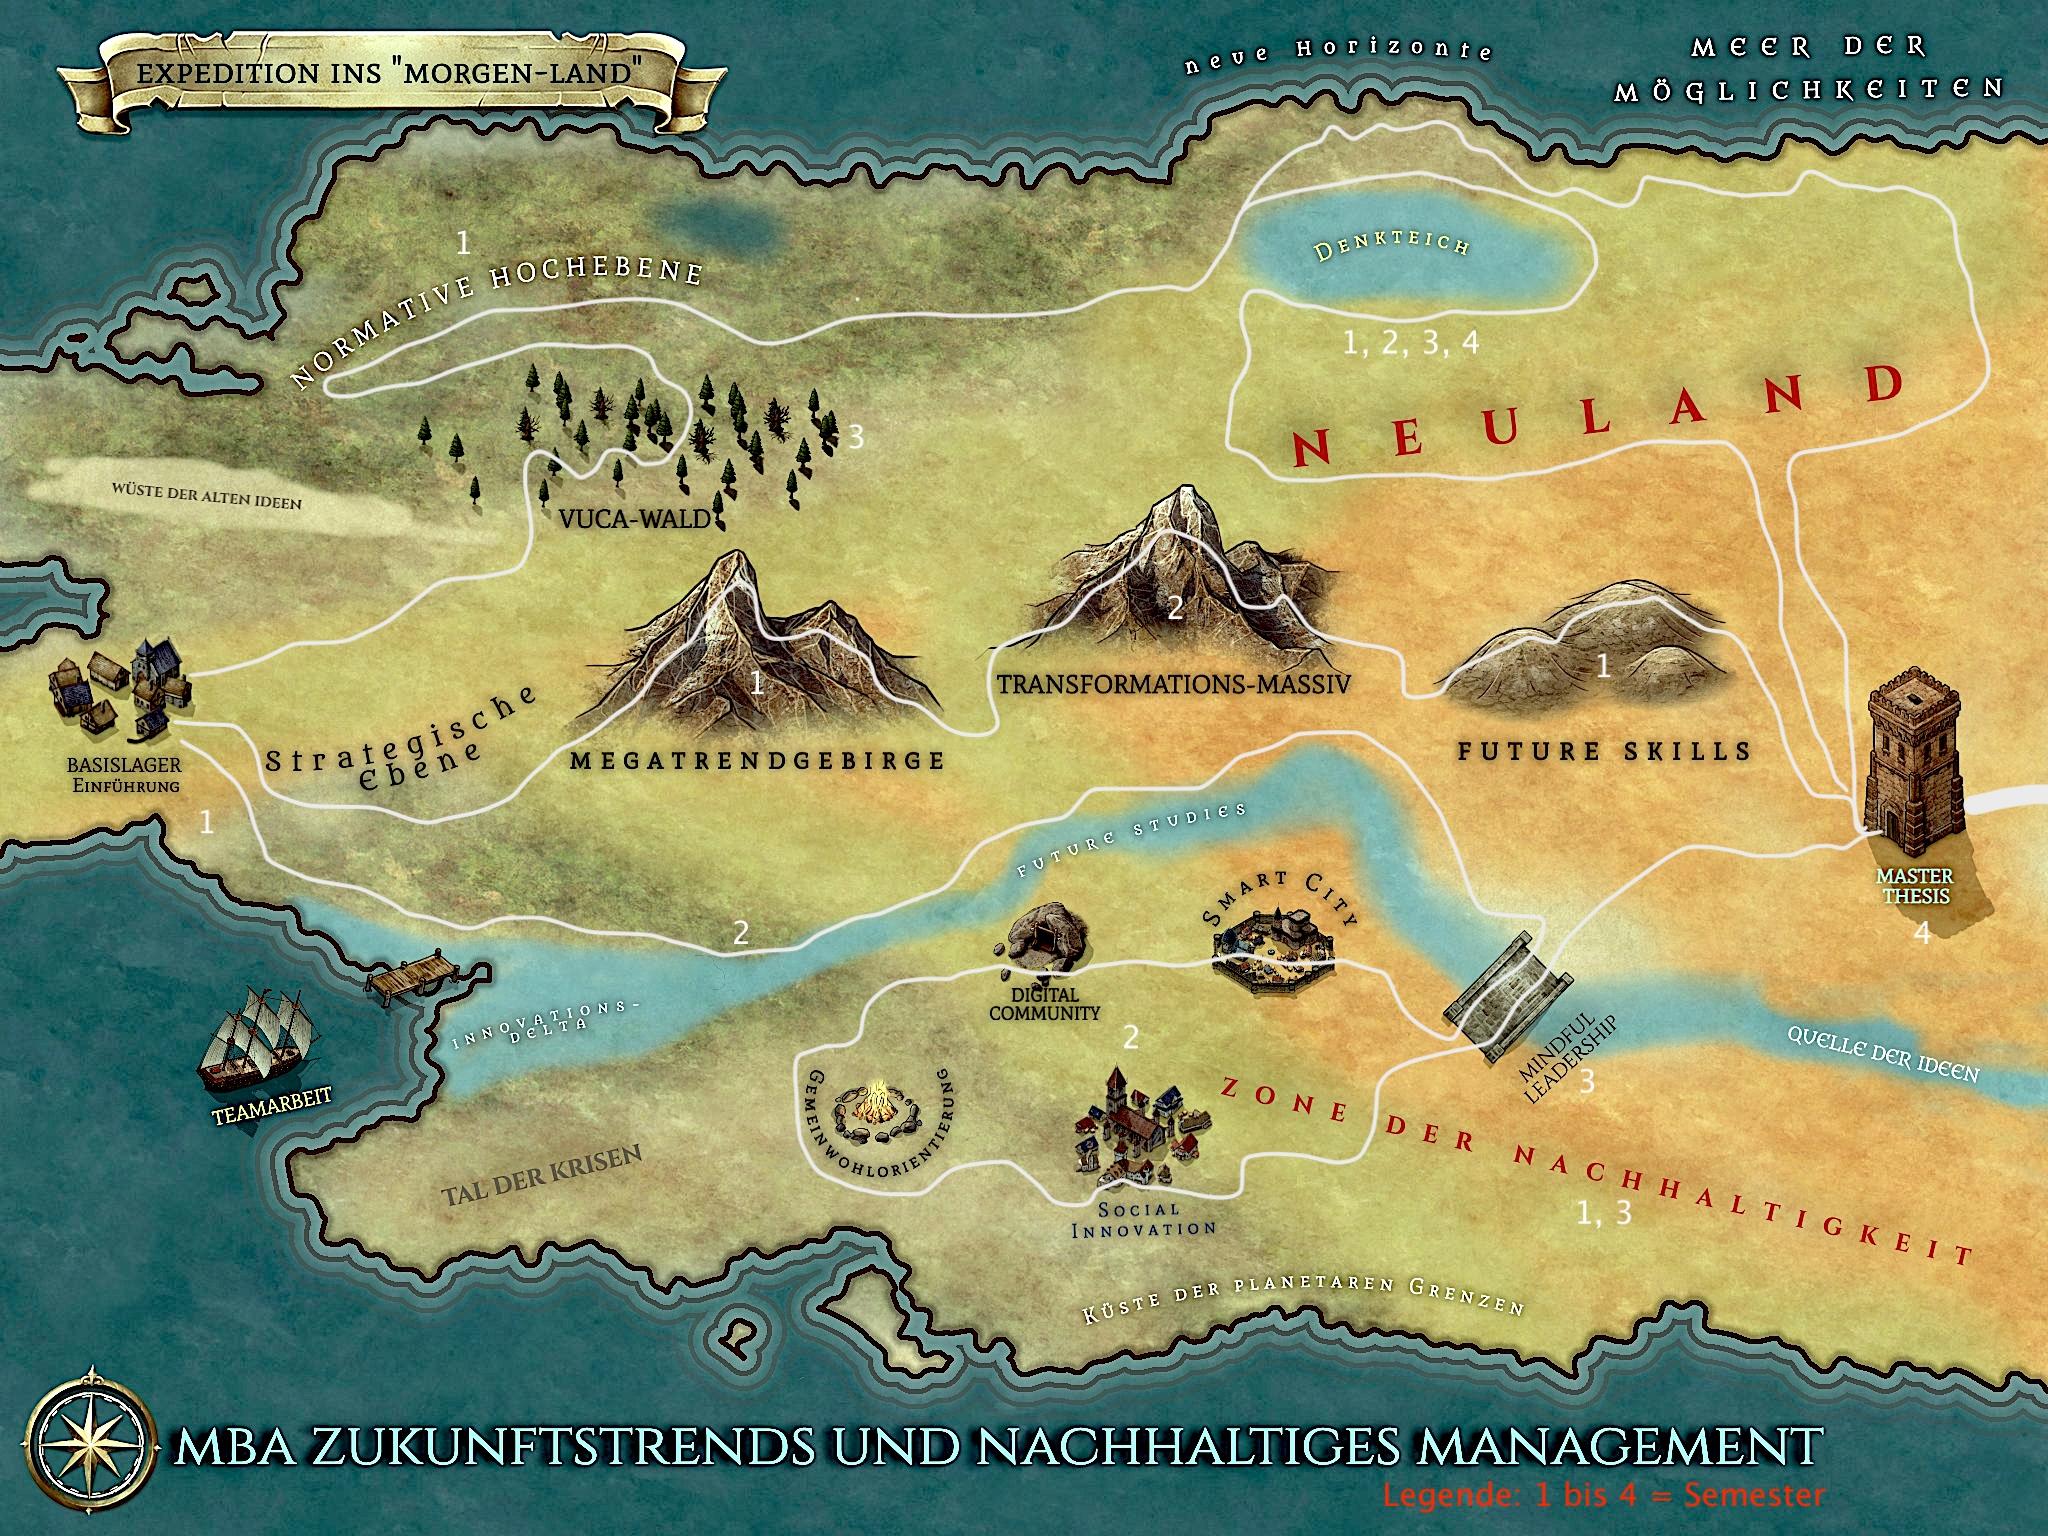 Expedition nach Neu-Land